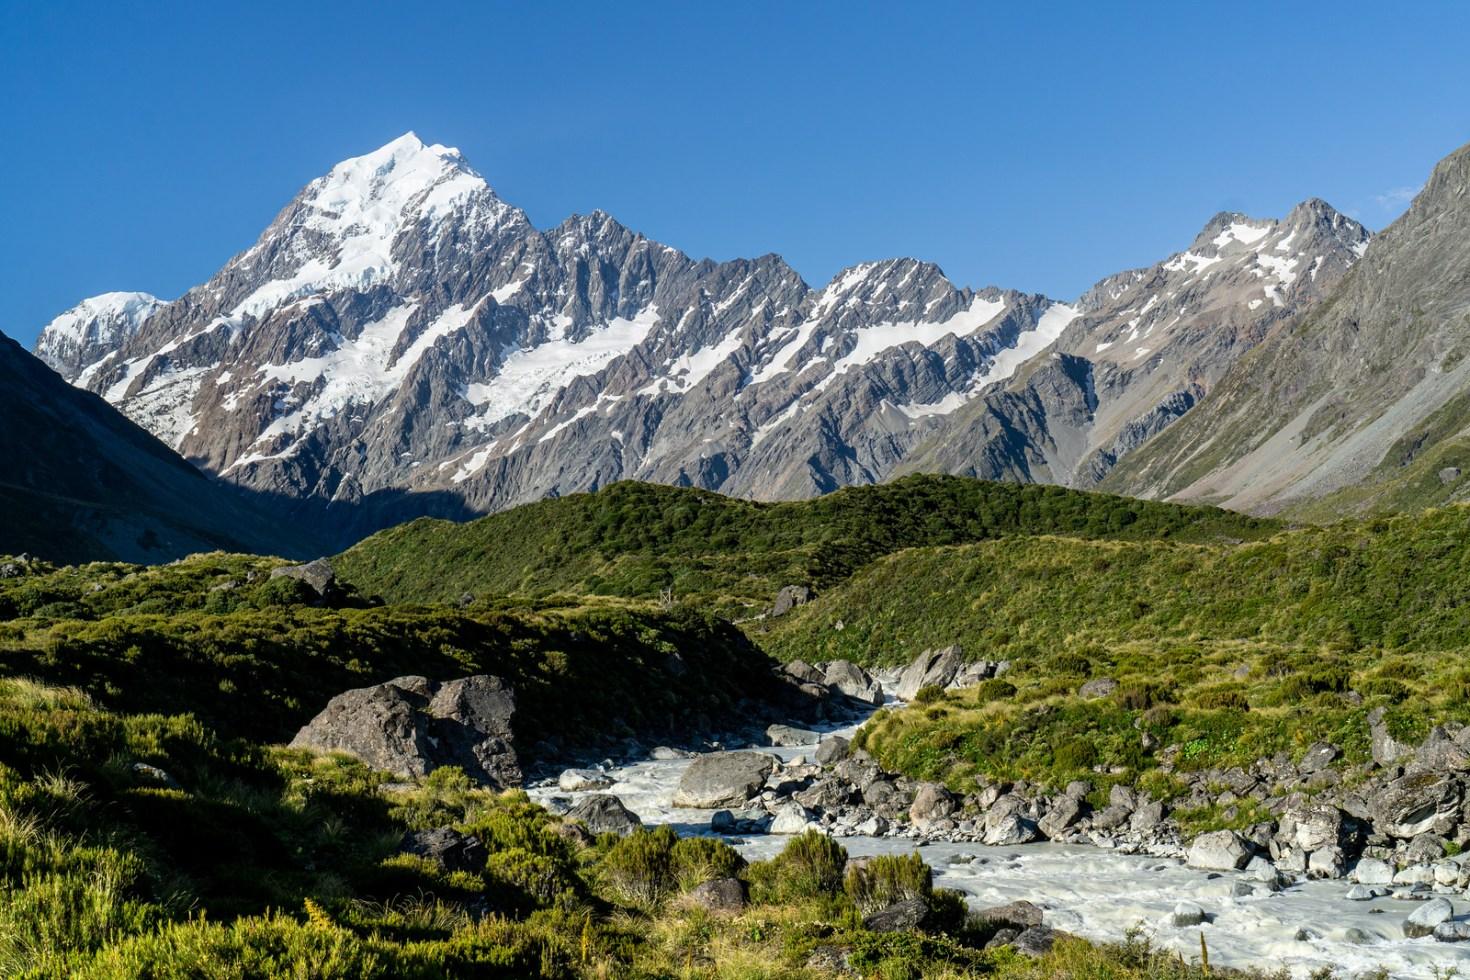 New Zealand - Aoraki Mount Cook National Park